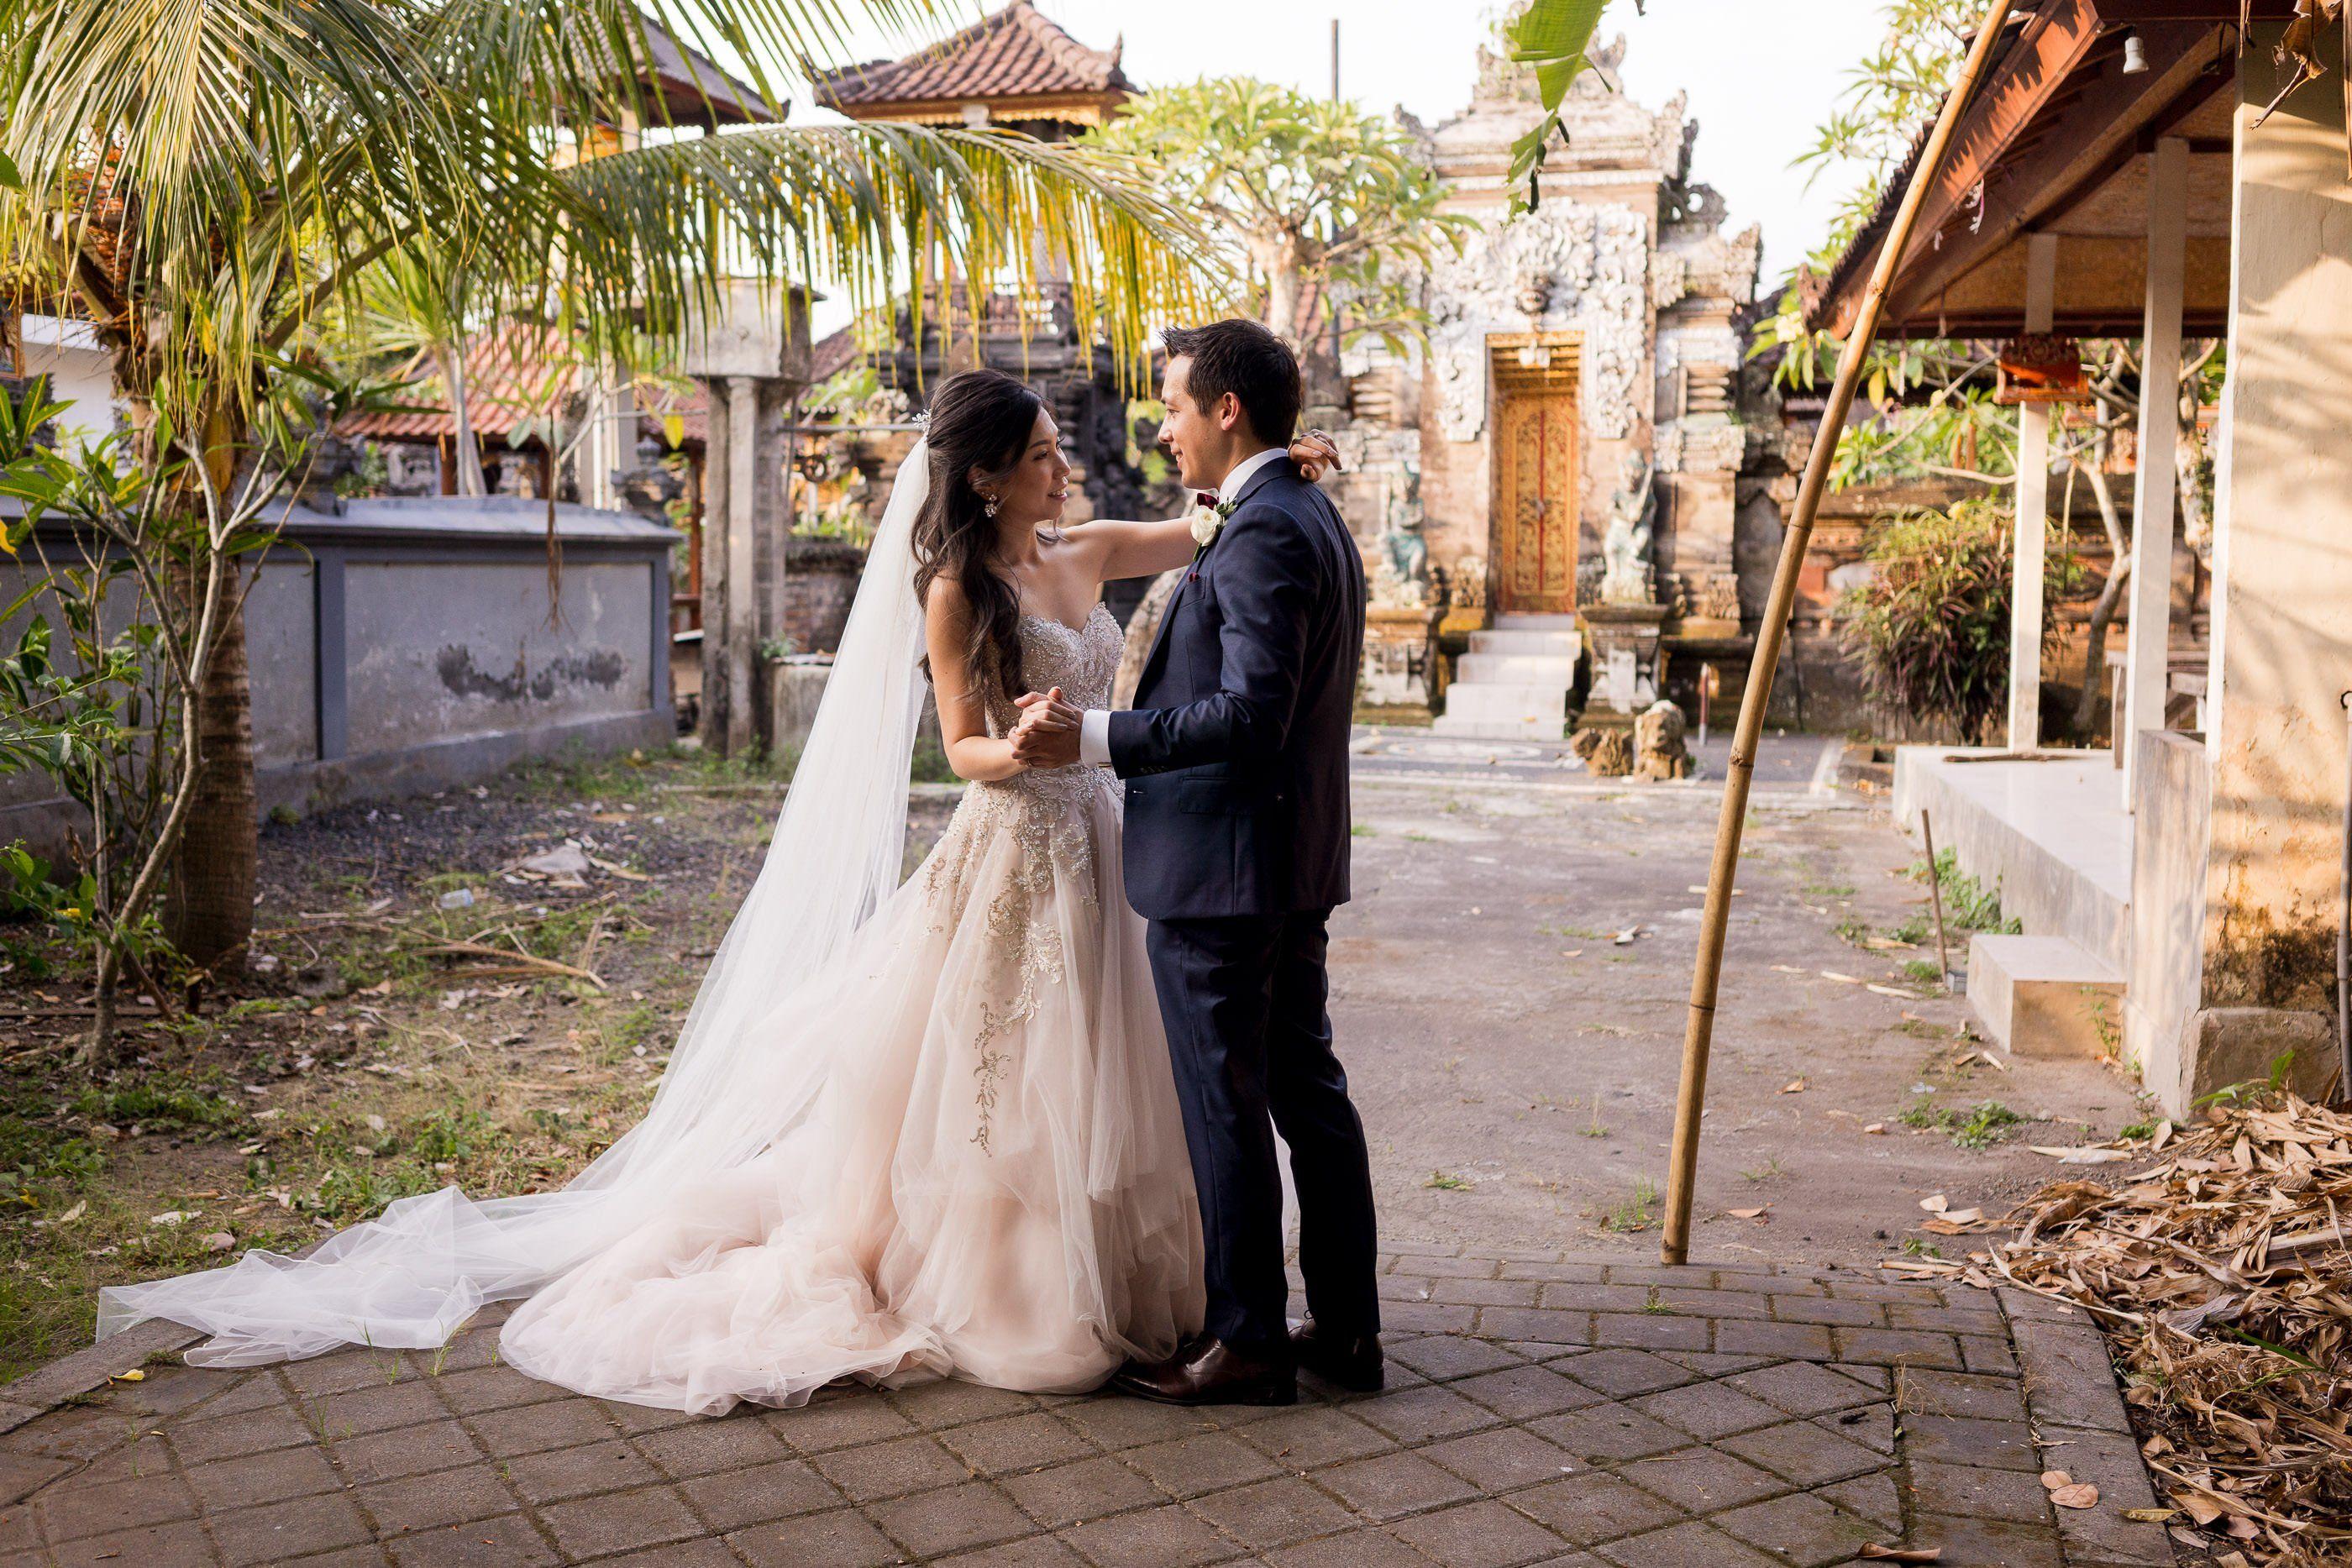 Indonesian wedding venues